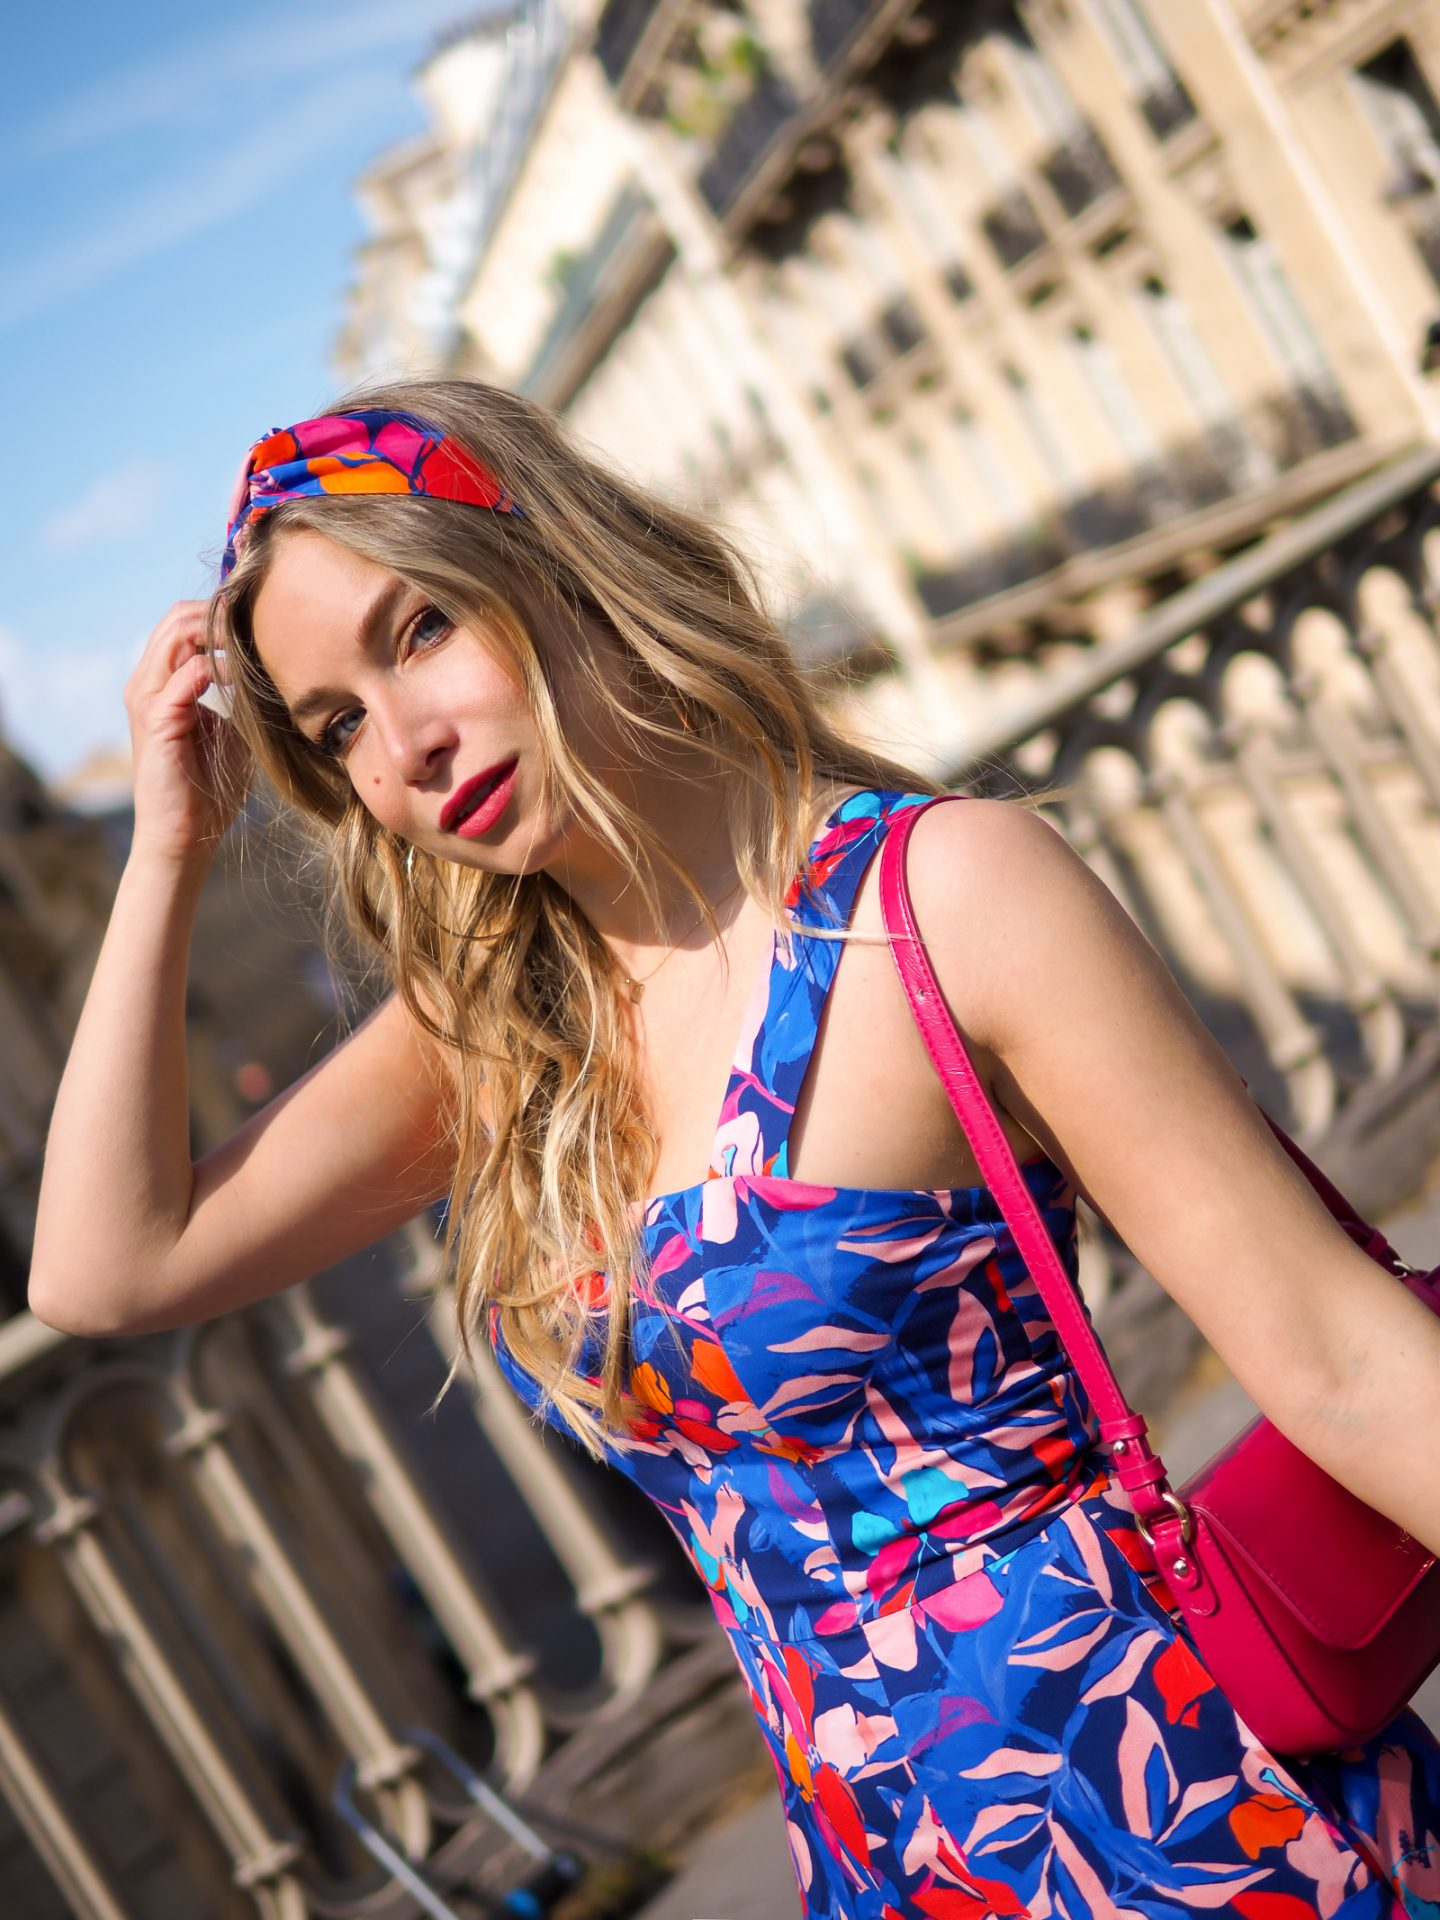 Dolce vita mood with Heroïnes Paris